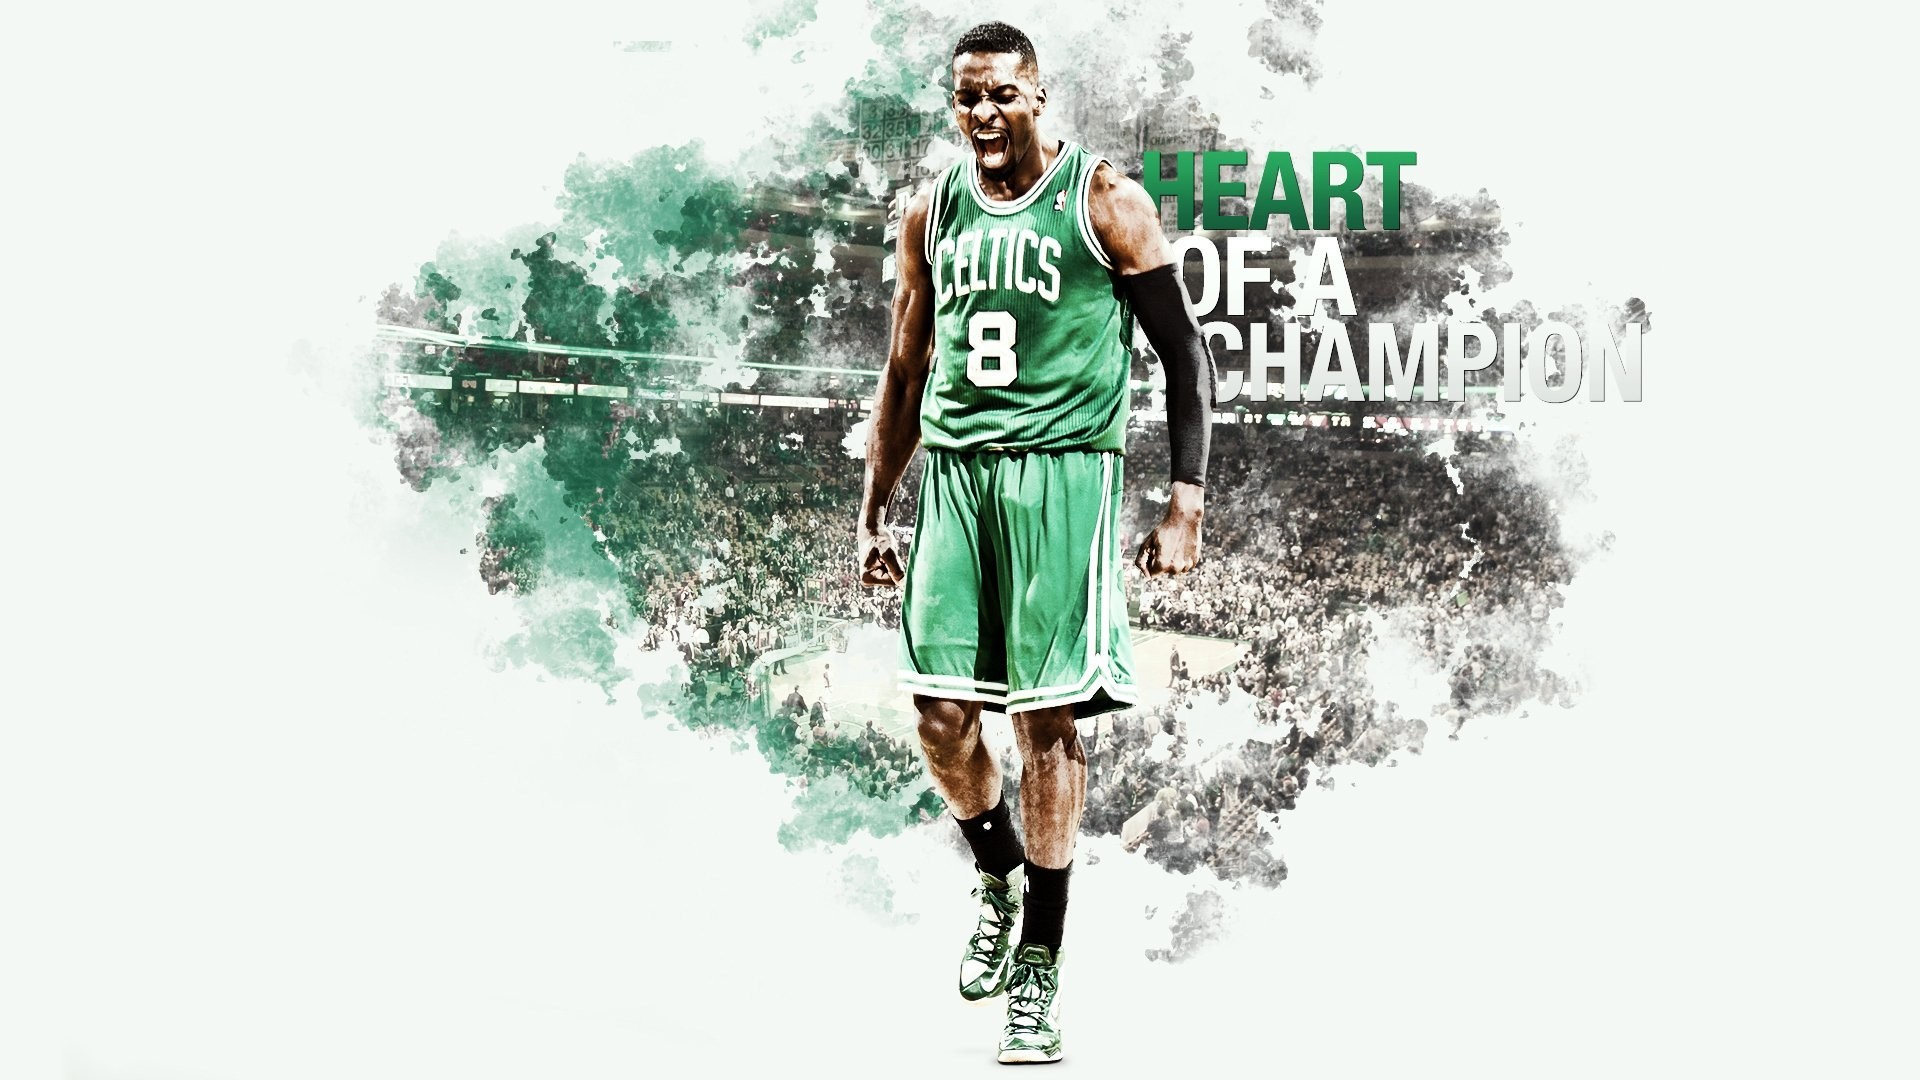 jeff green jeff green boston ma celtics boston celtics basketball sports nba